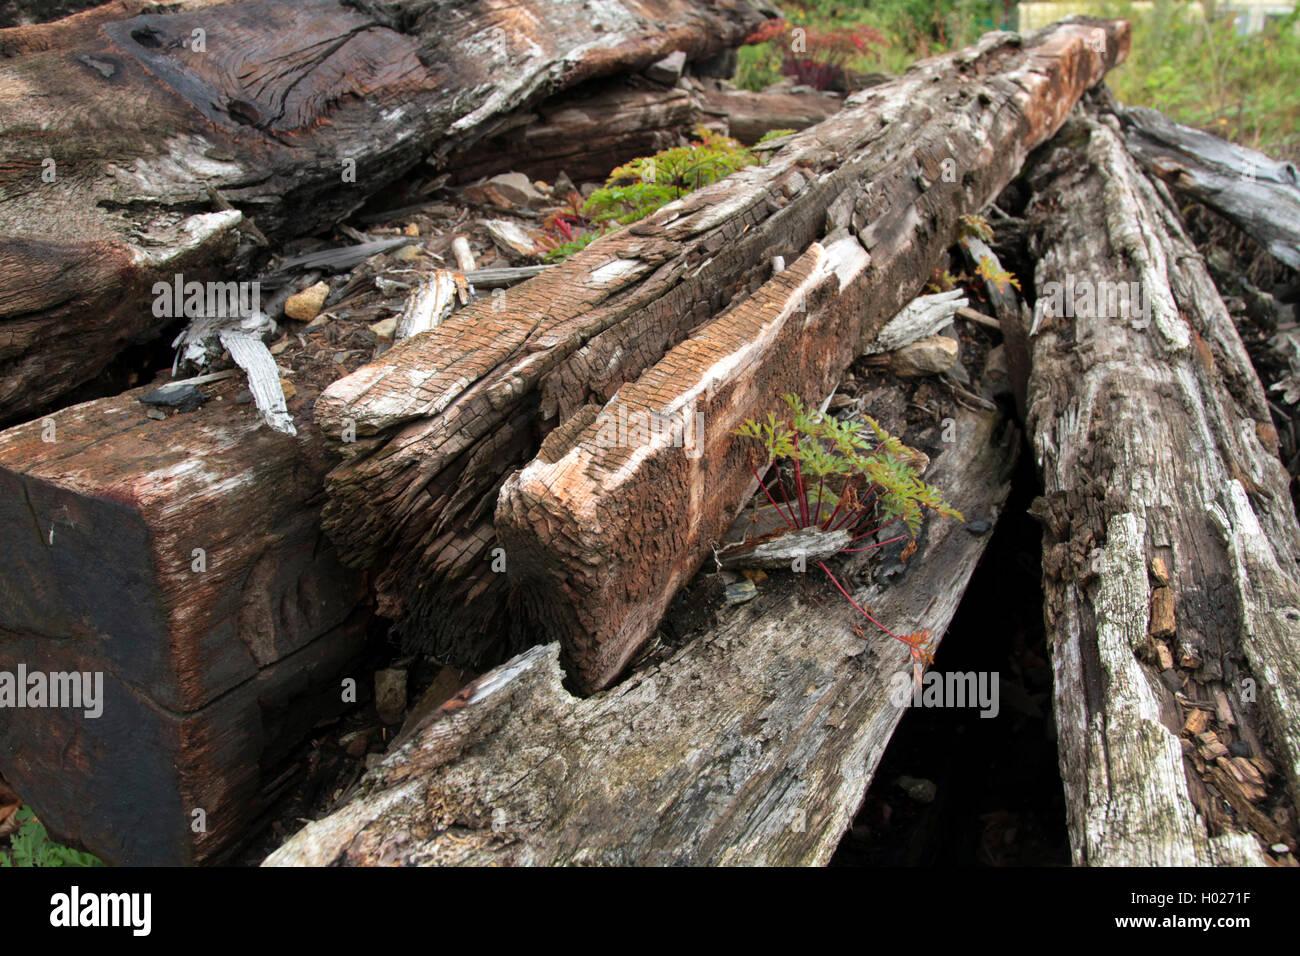 RUPRECHTSKRAUT, Ruprechtkraut, Stinkender Storchschnabel, Stink-Storchschnabel, Stinkstorchschnabel (Geranium Robertianum, Stockbild